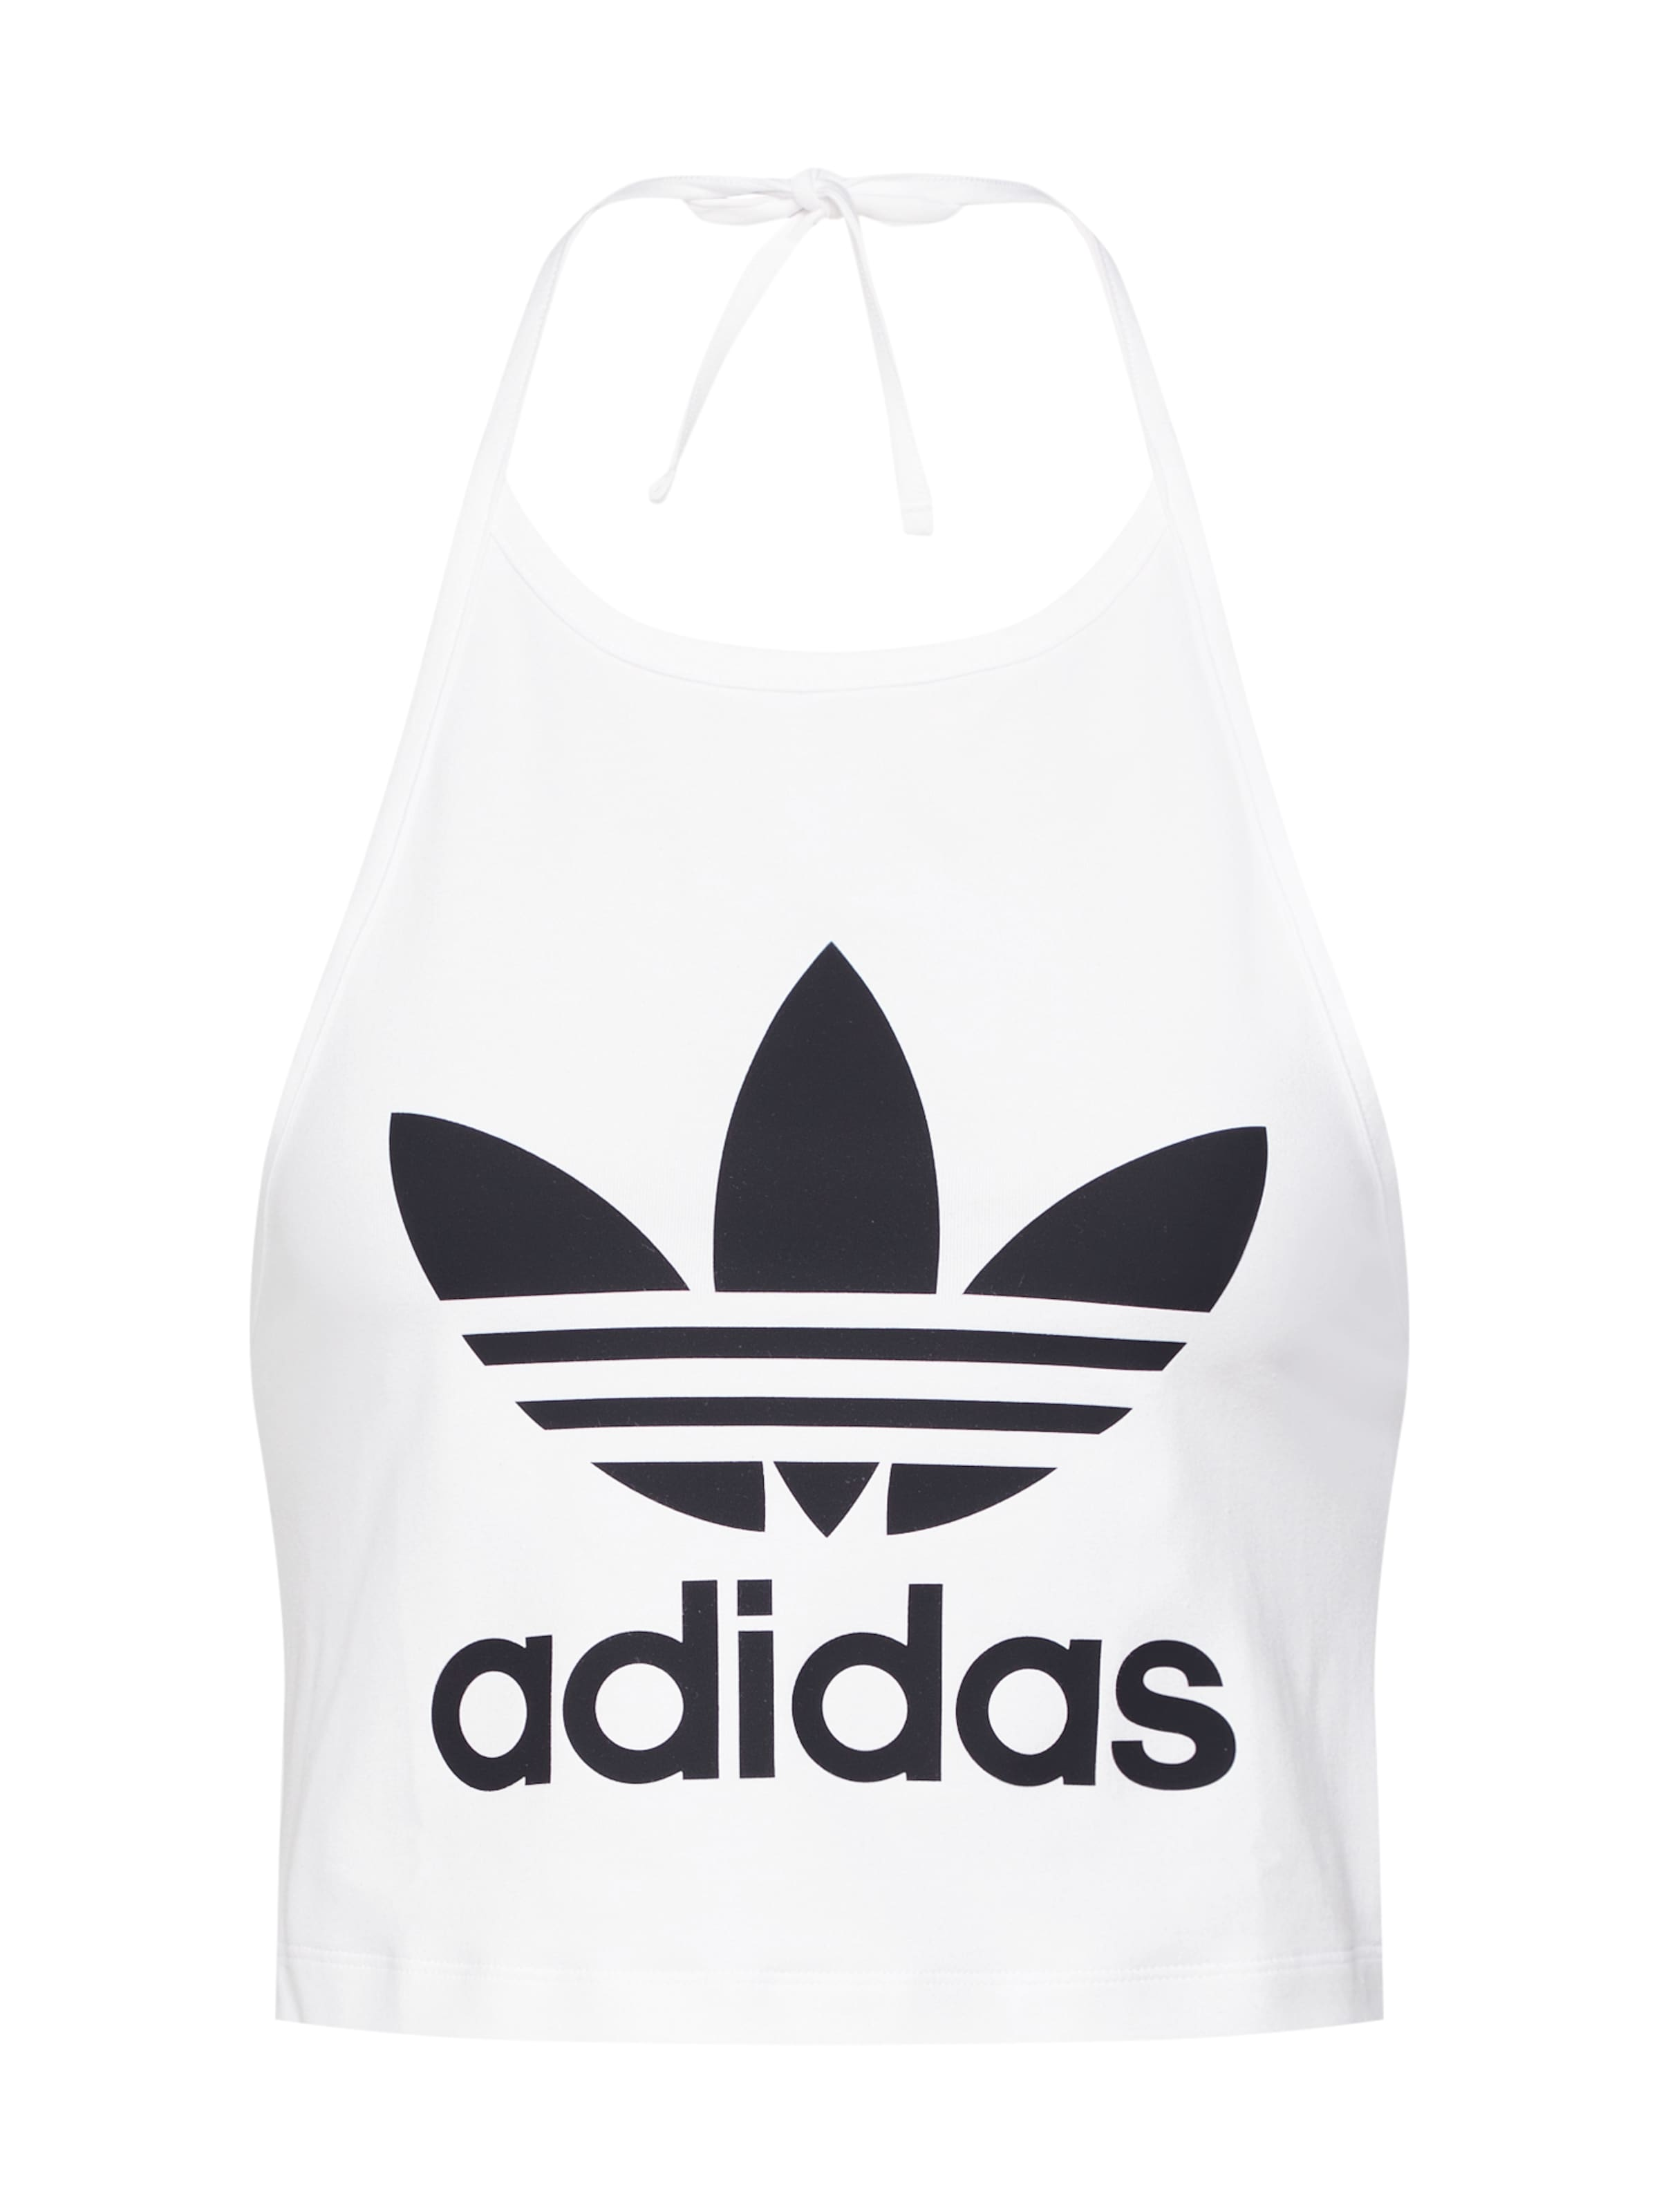 NoirBlanc Haut 'trefoil Adidas Originals Tank' En 1TFKlc3uJ